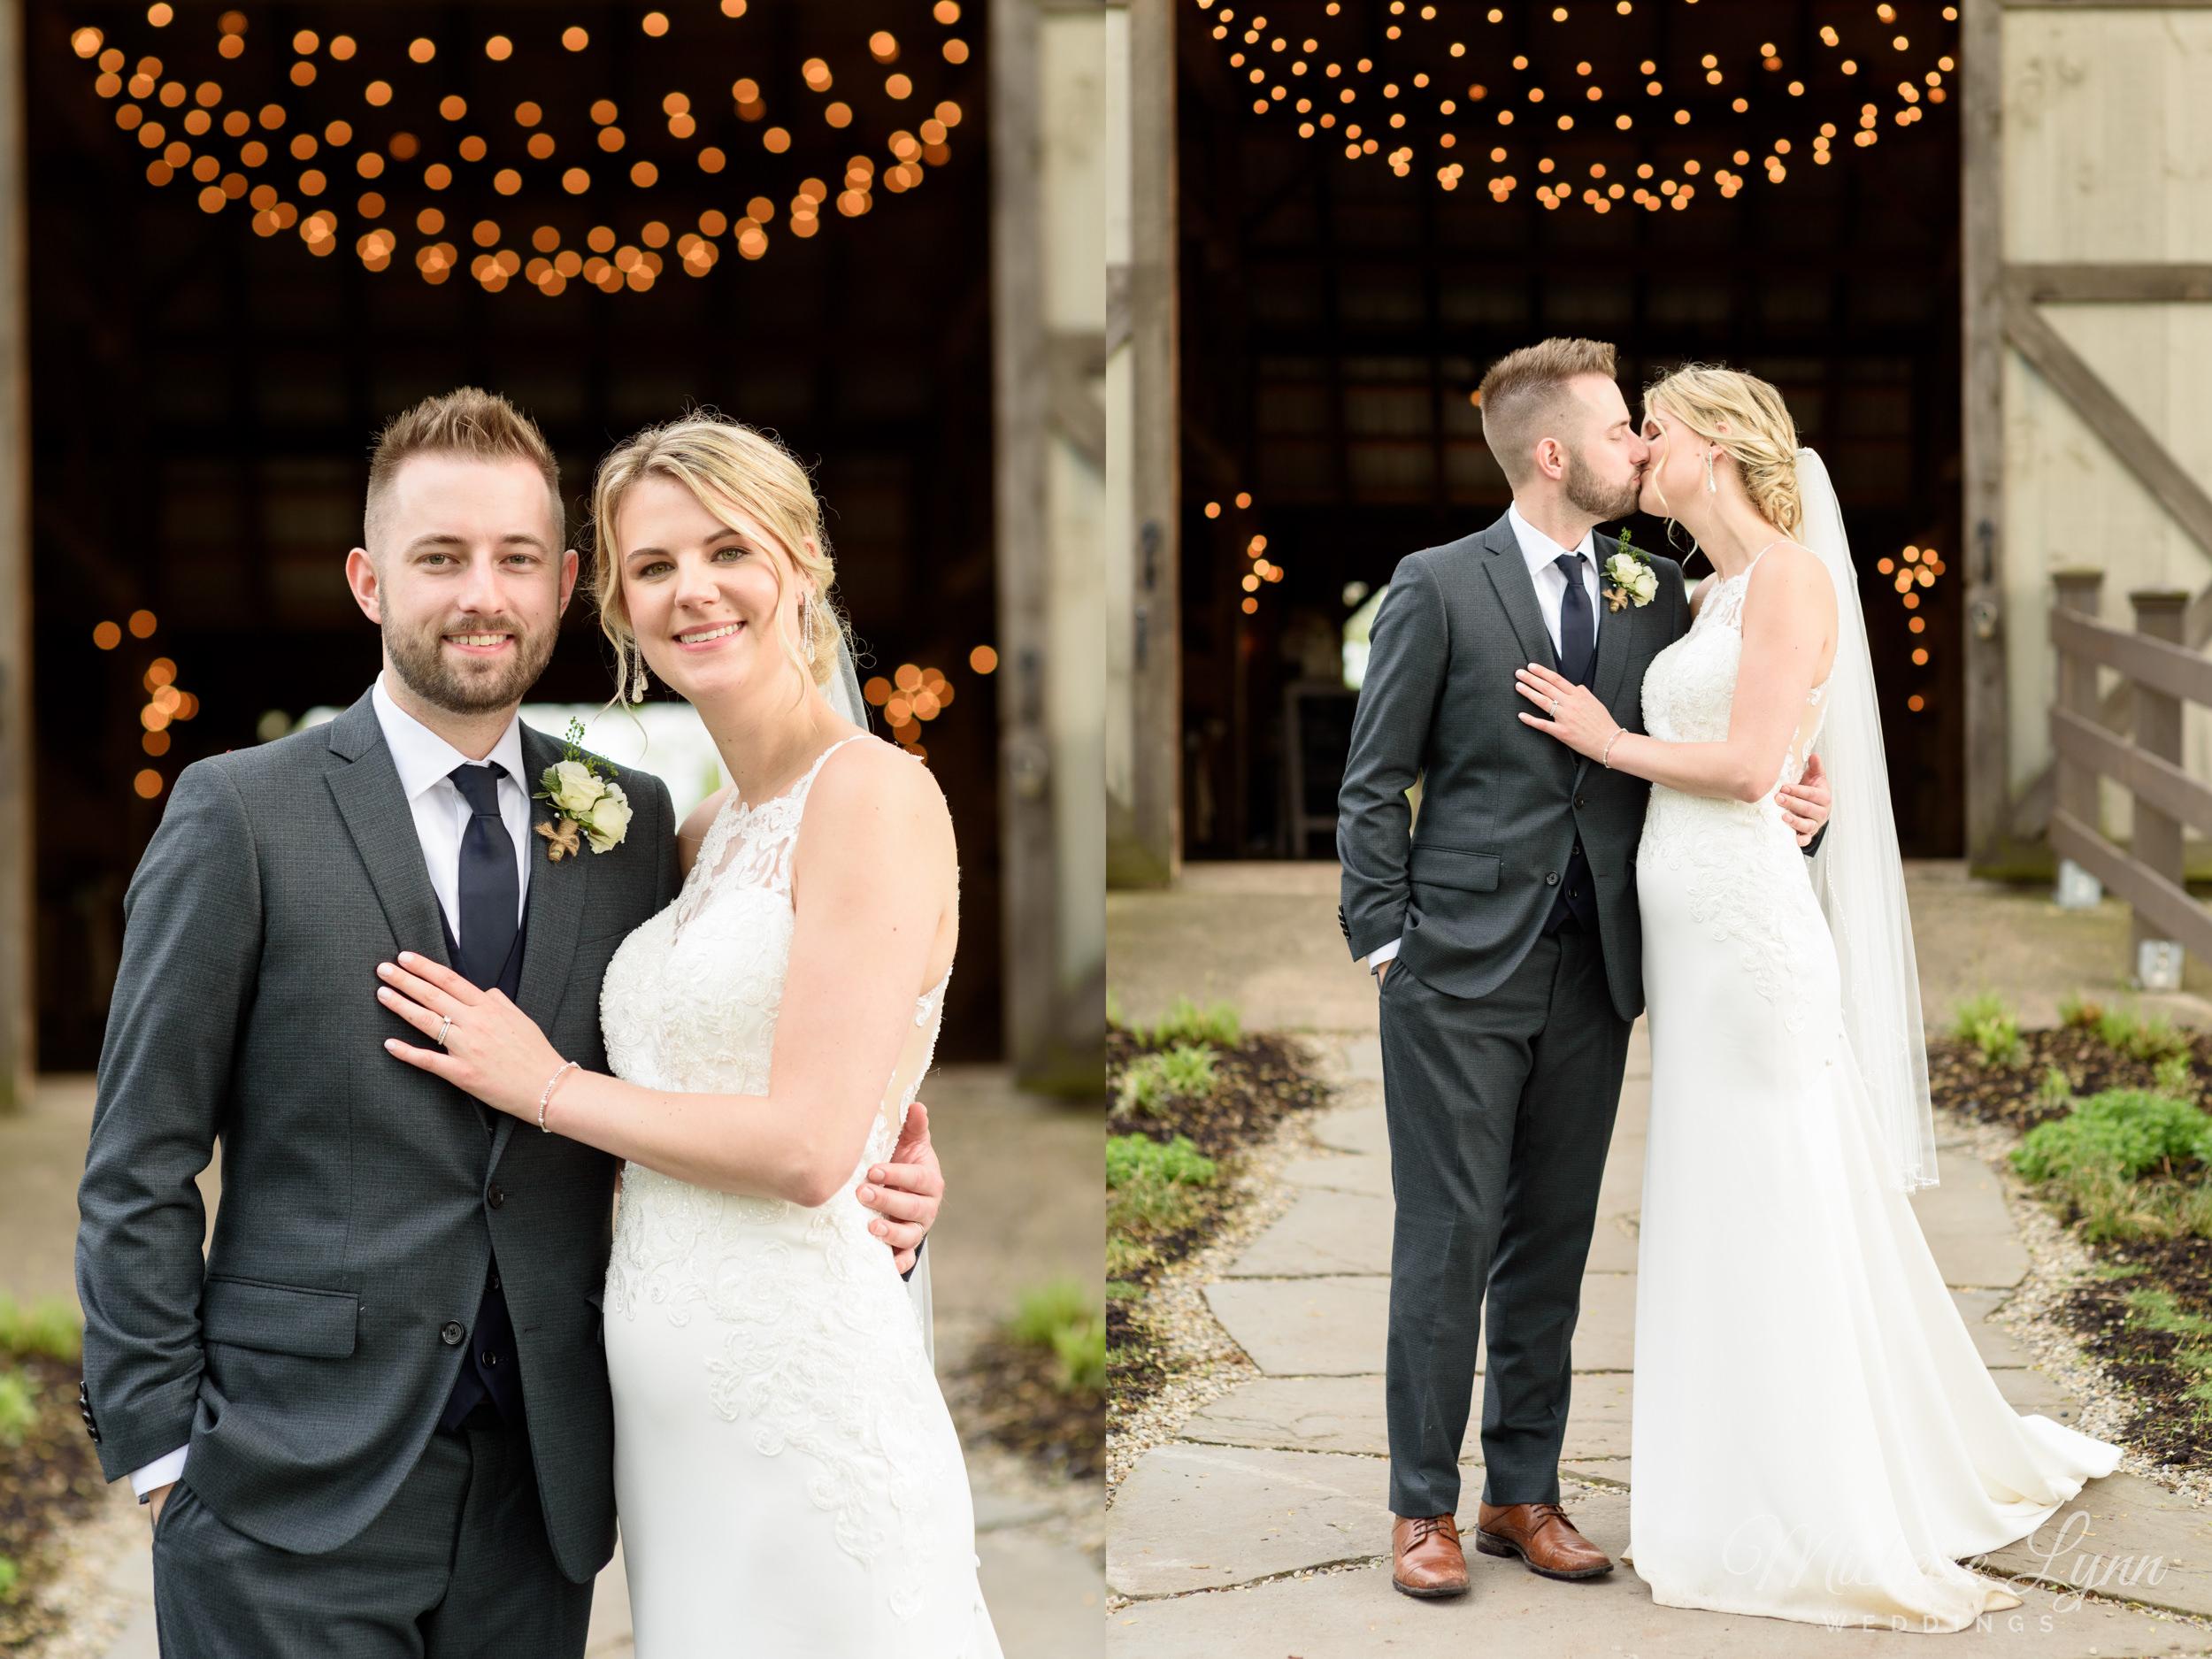 mlw-the-farm-bakery-and-events-wedding-photos-53.jpg